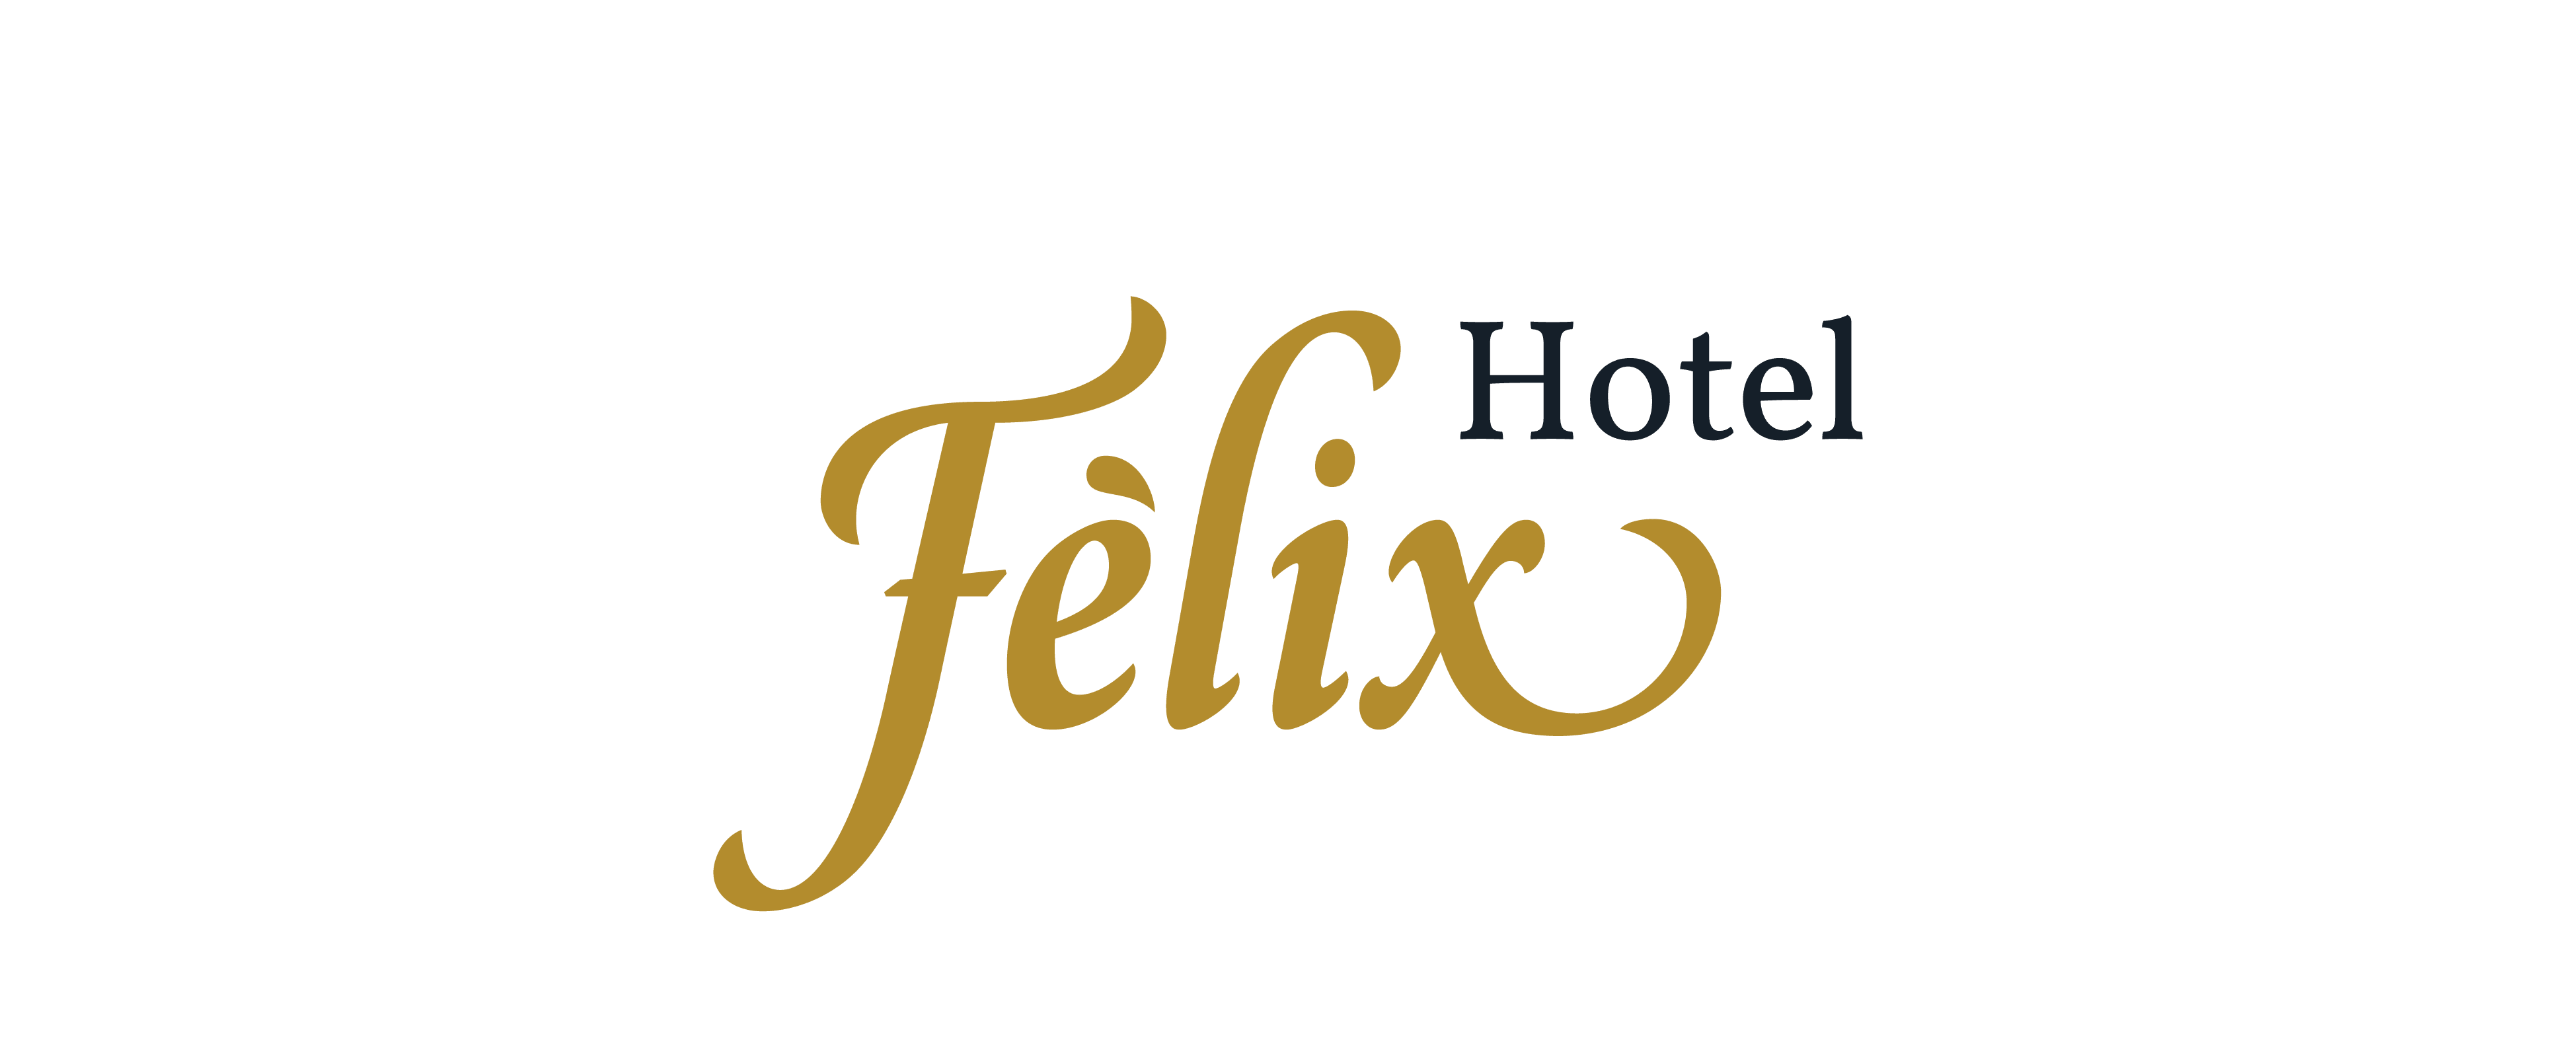 Fèlix Hotel Logo